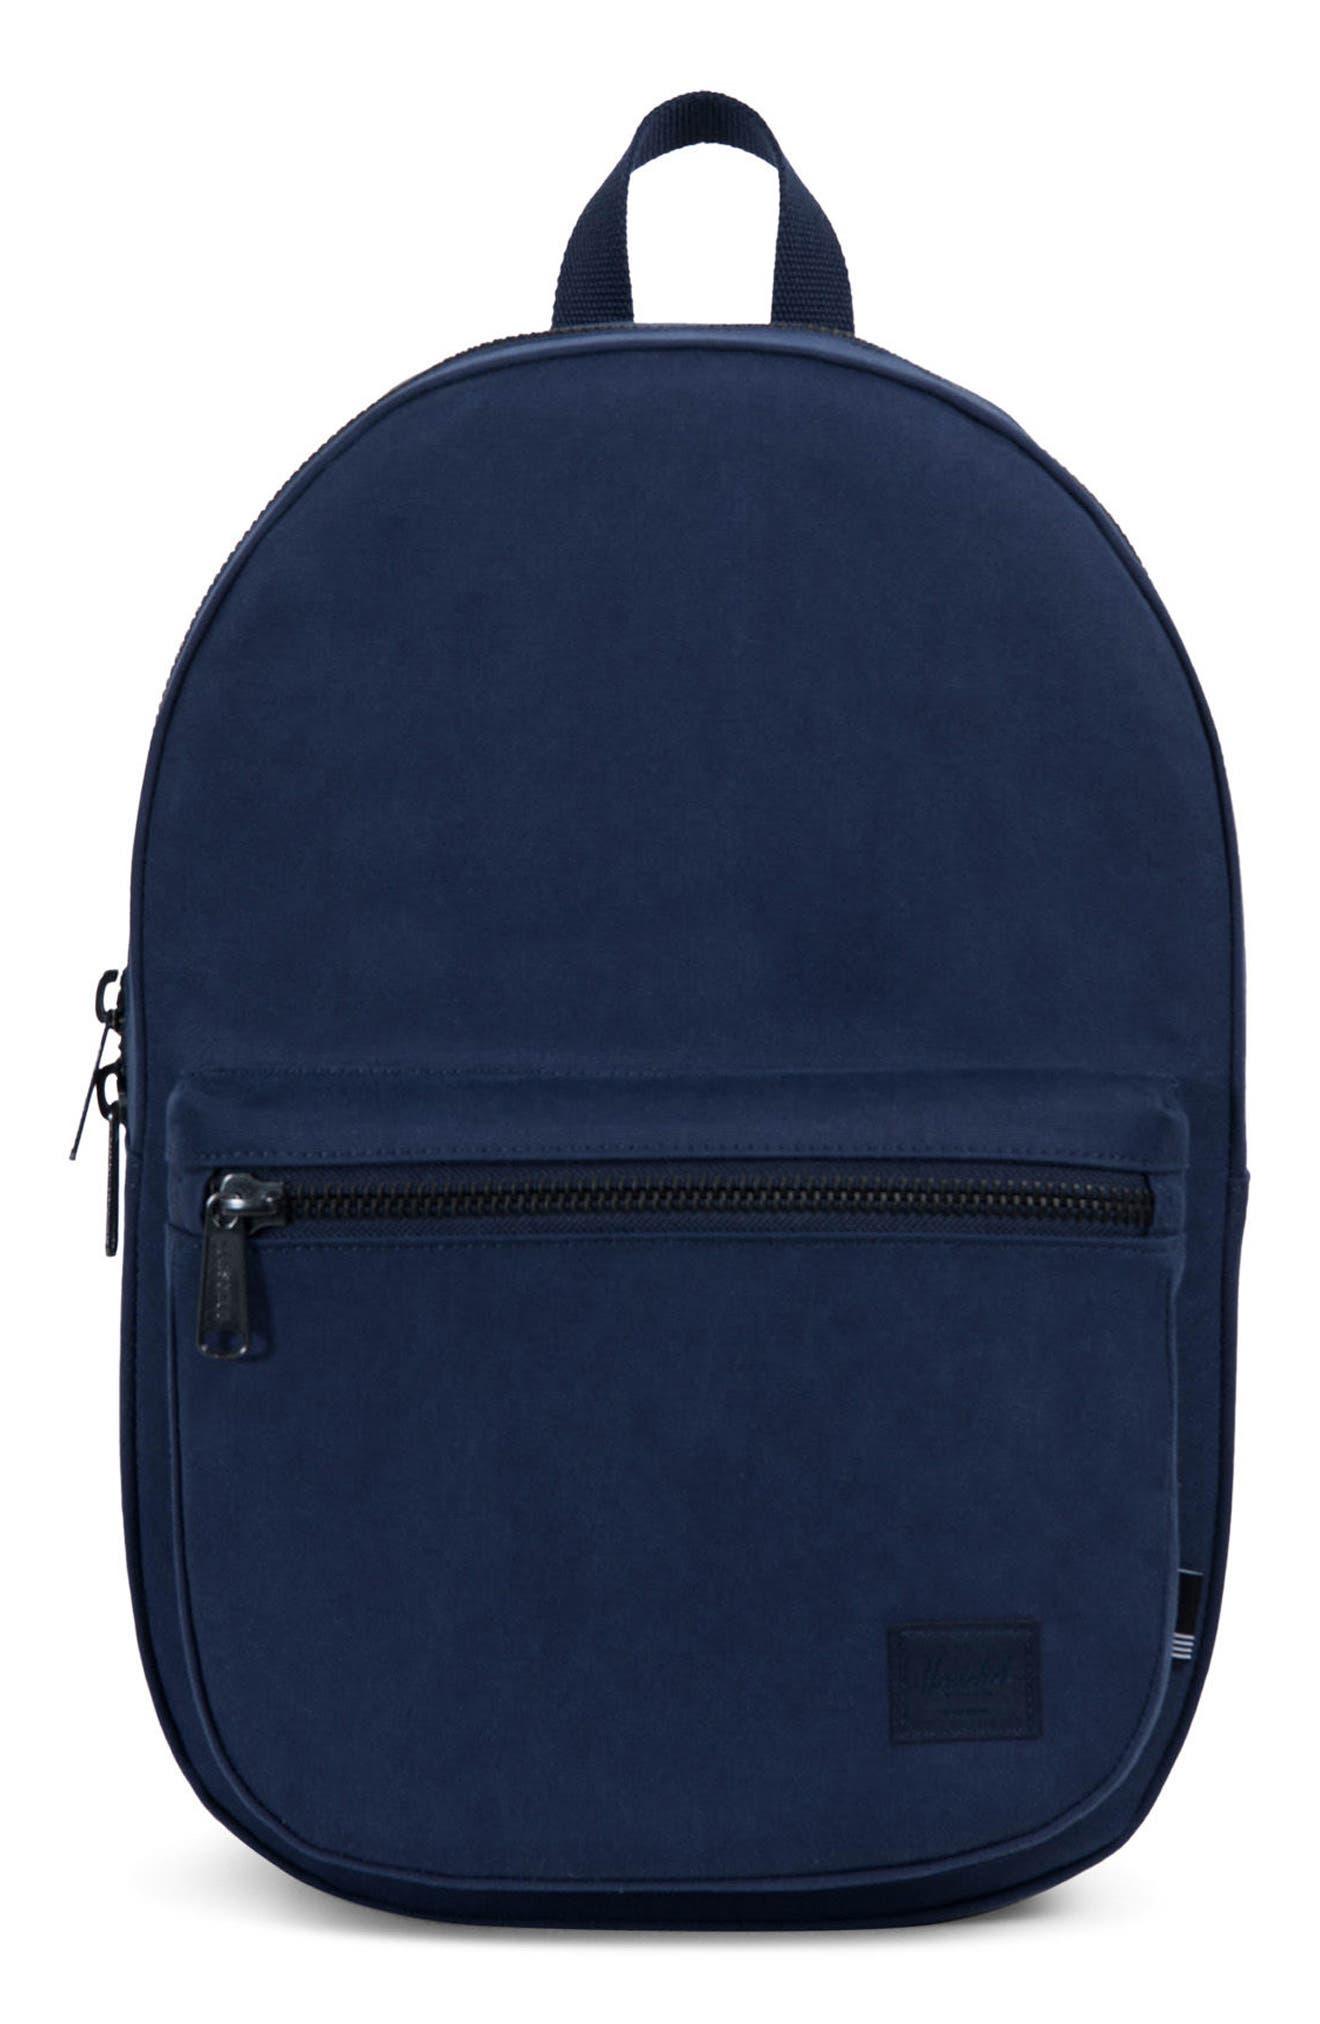 Alternate Image 1 Selected - Herschel Supply Co. Lawson Backpack